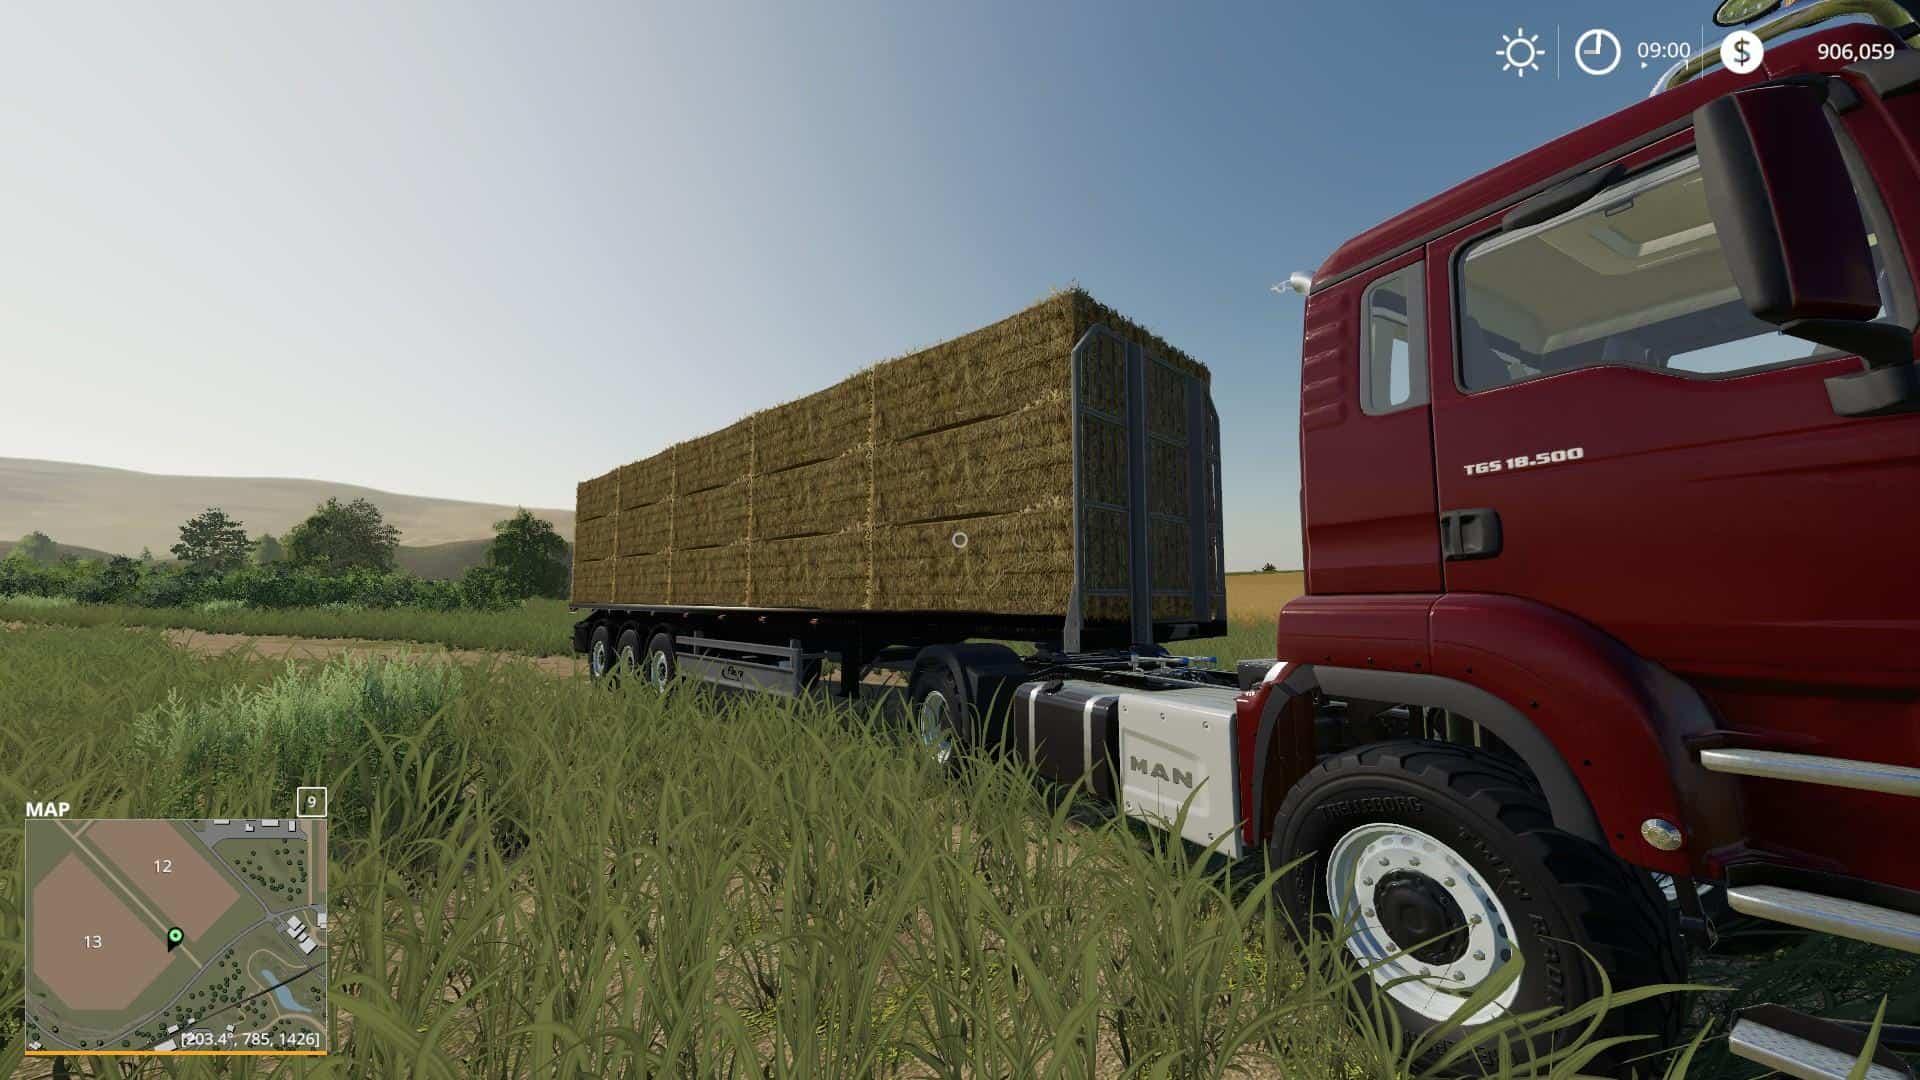 Fliegl flatbed squarebale autoload v1 0 0 2 FS19 - Farming